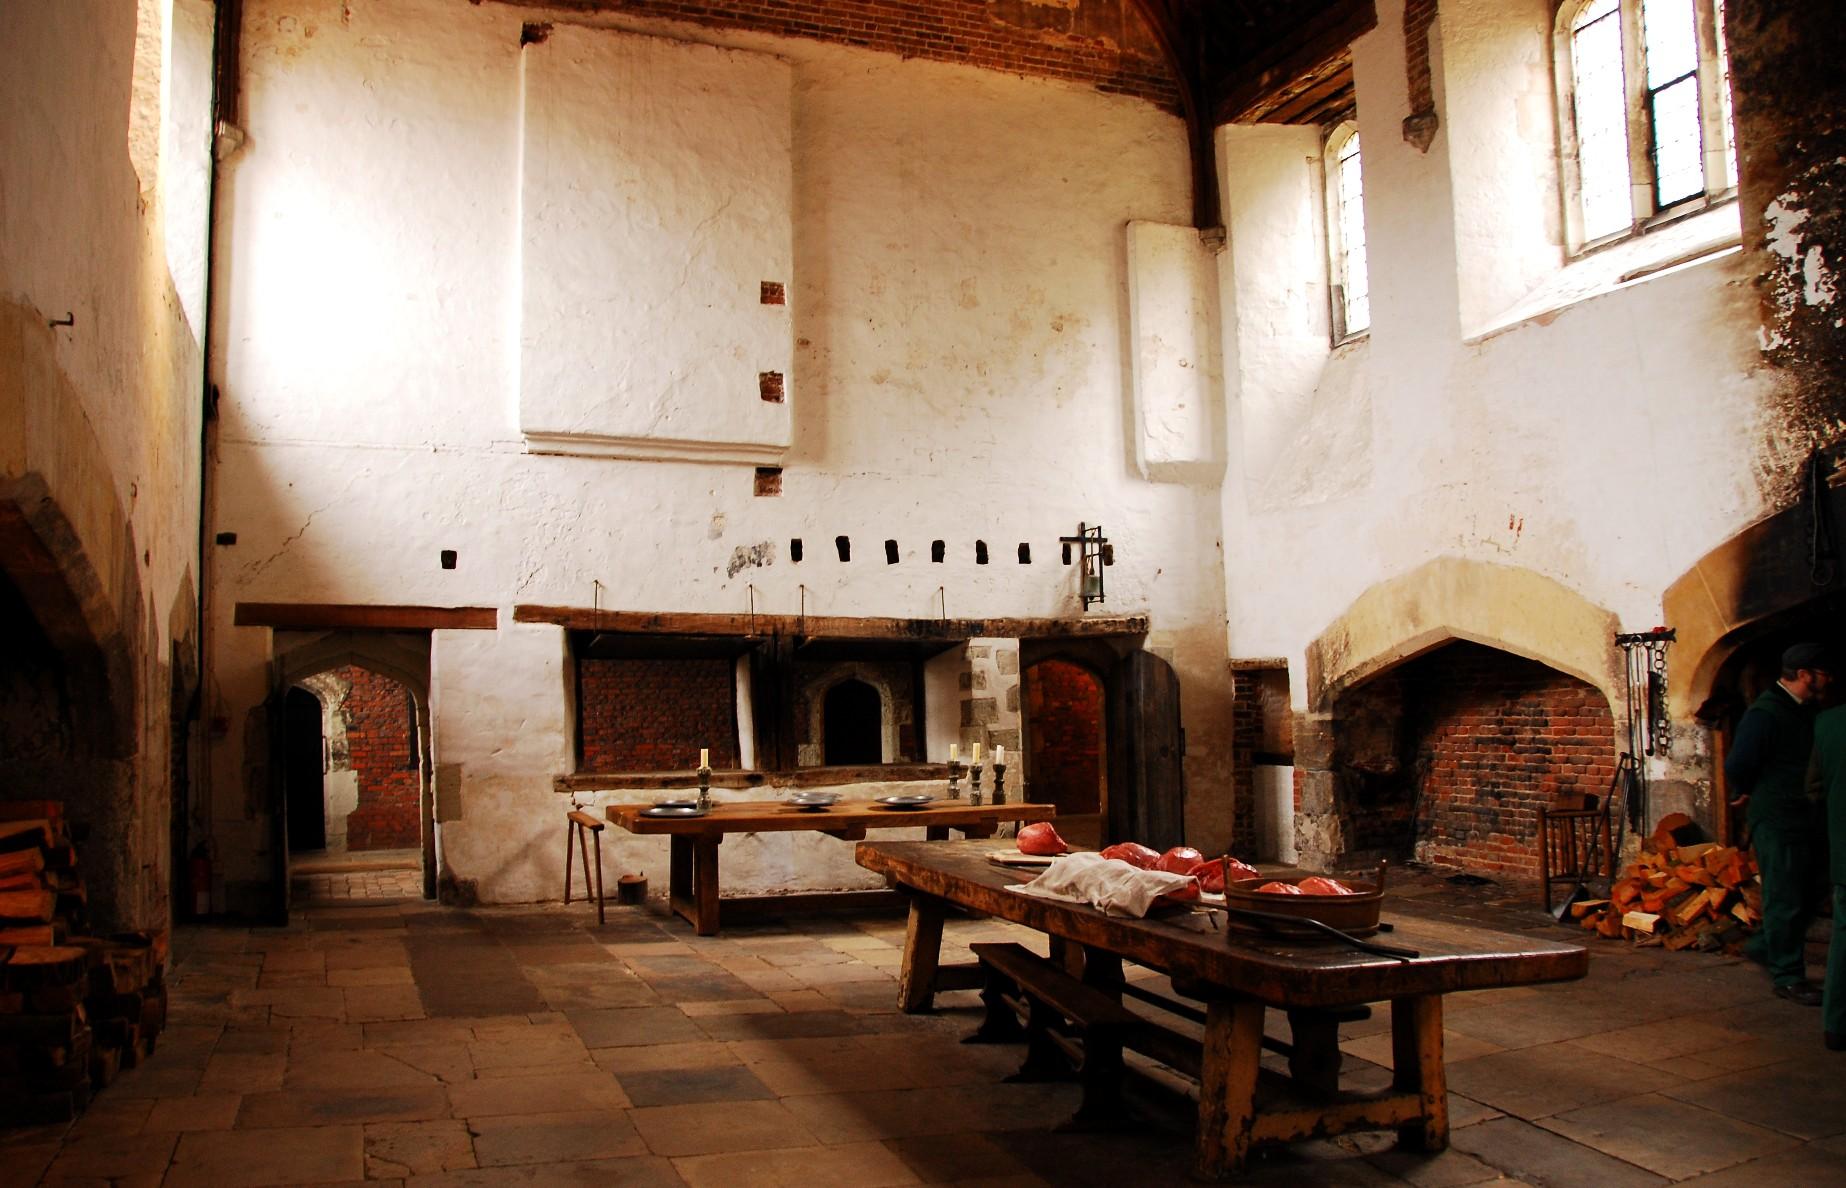 Tudor Kitchens 4, Hampton Court Palace: NEN Gallery